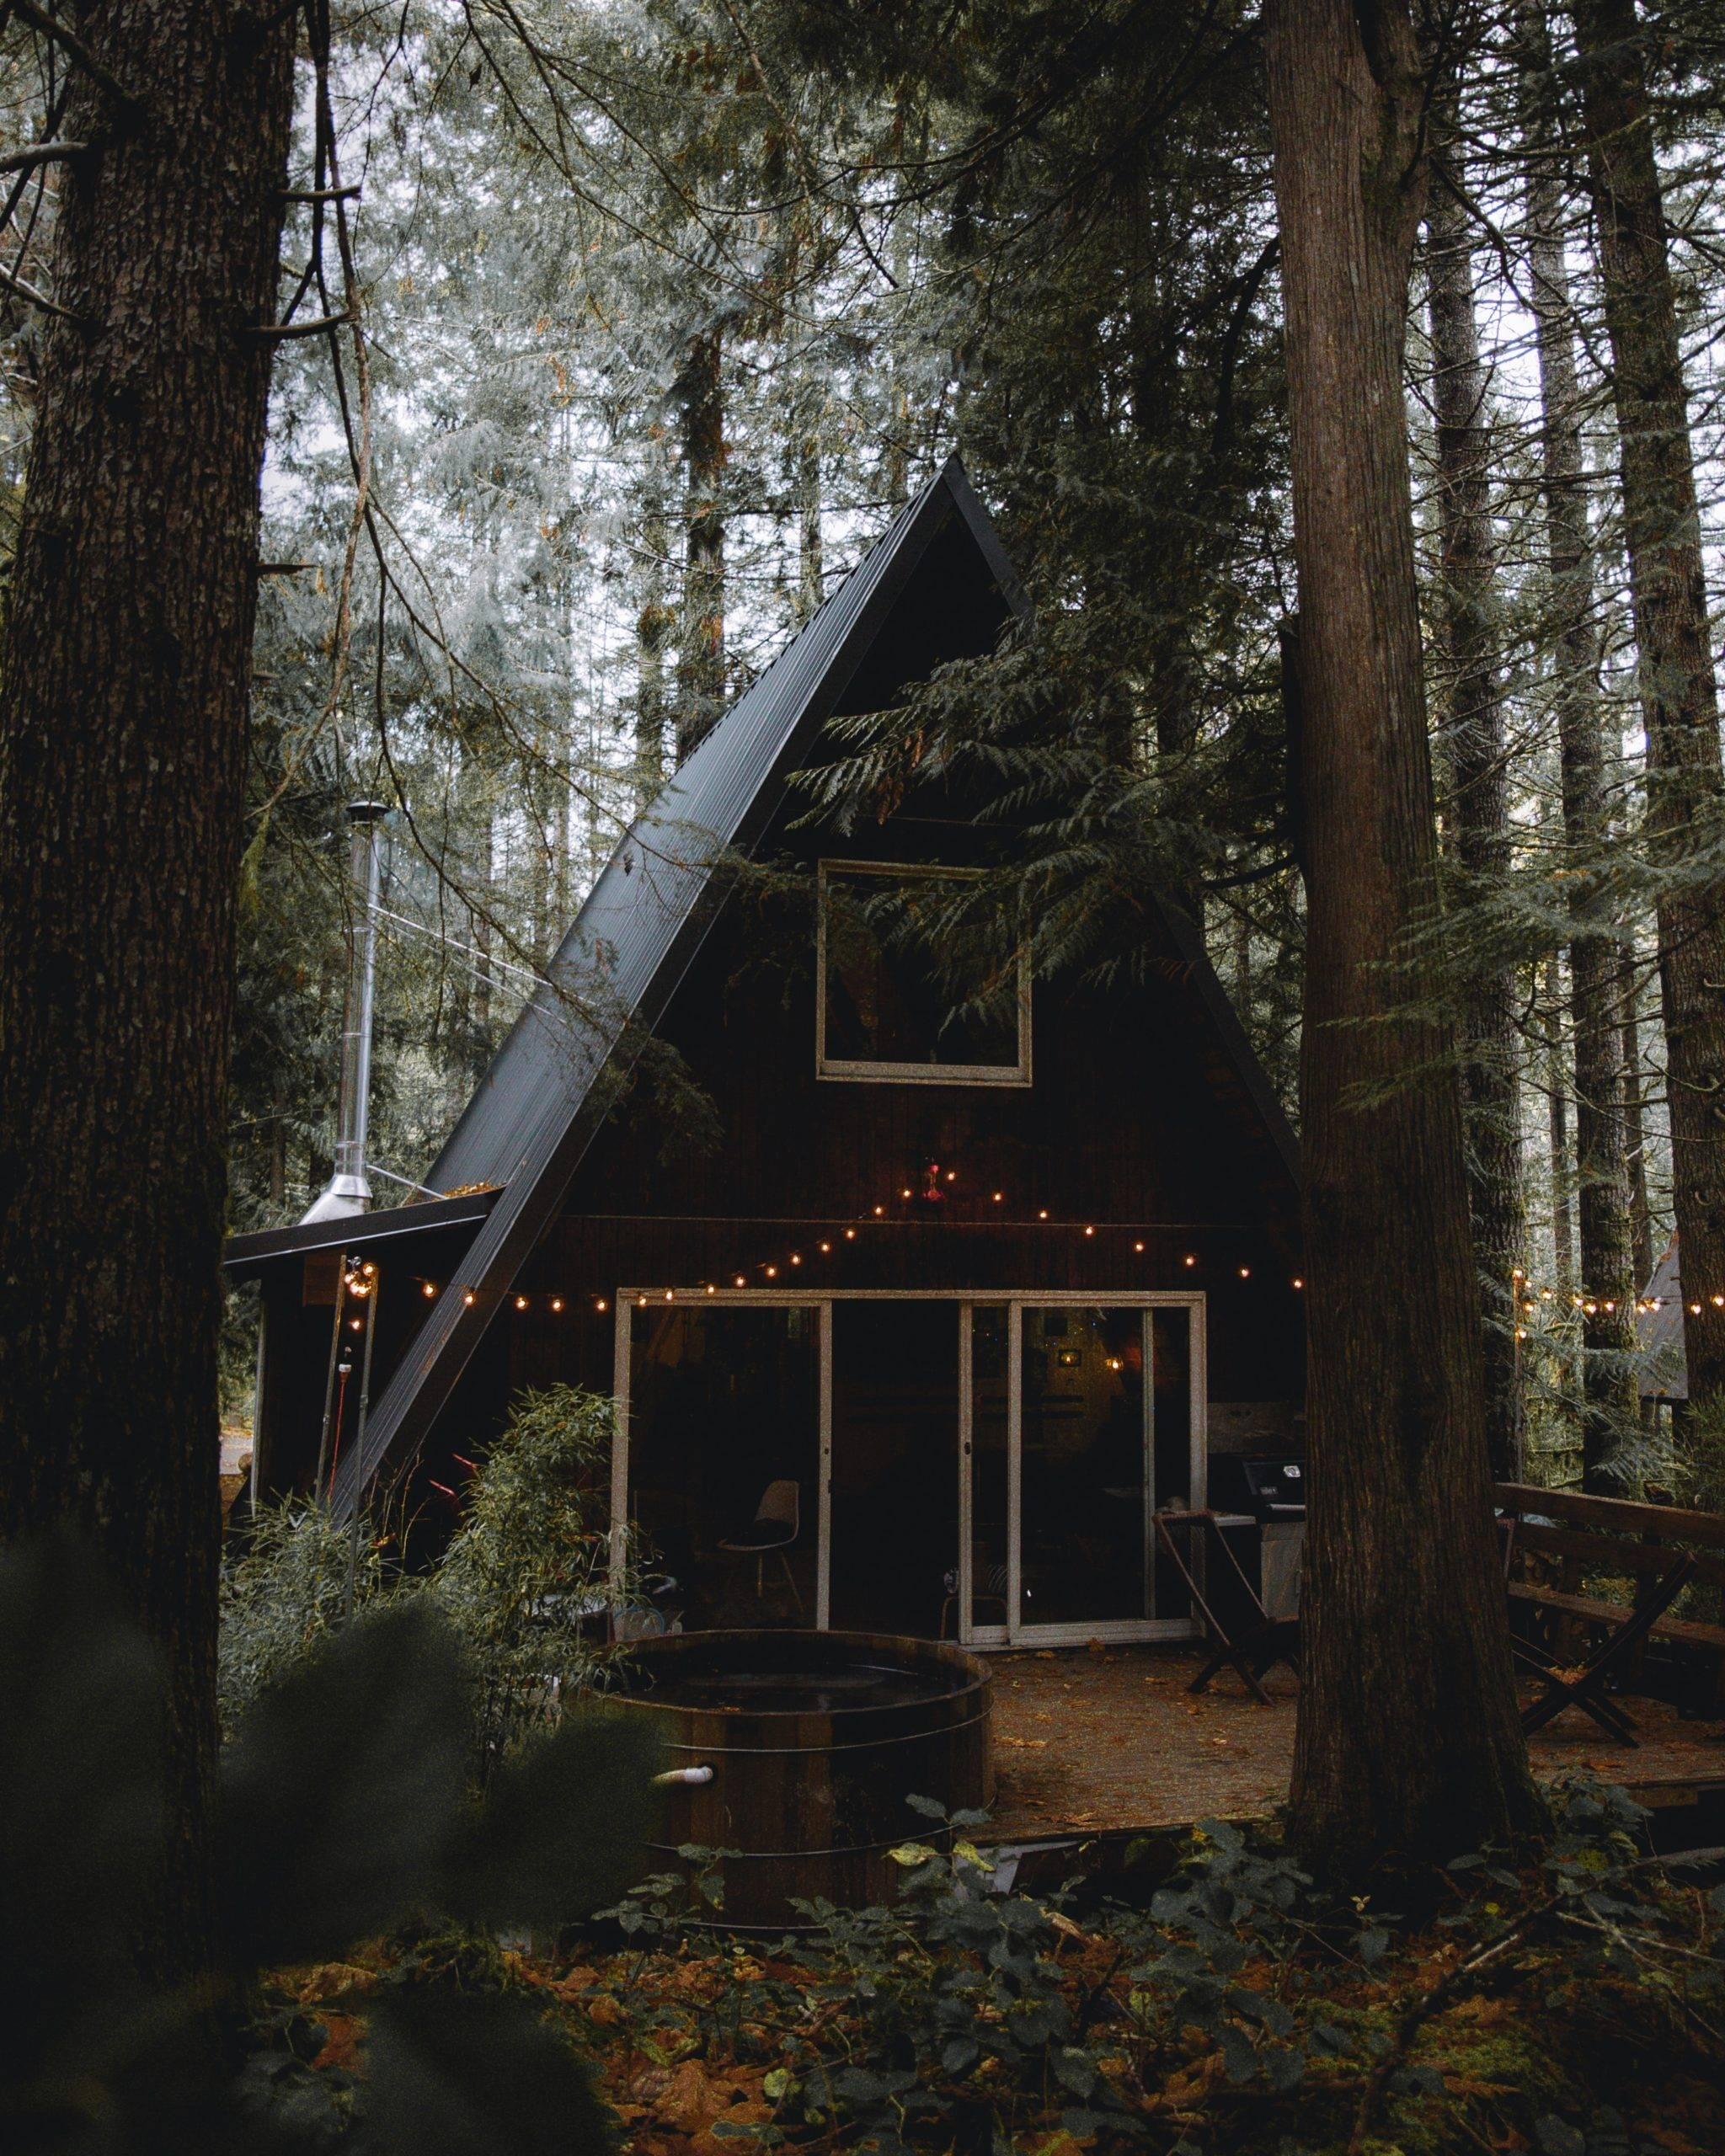 Black house hidden among tall trees